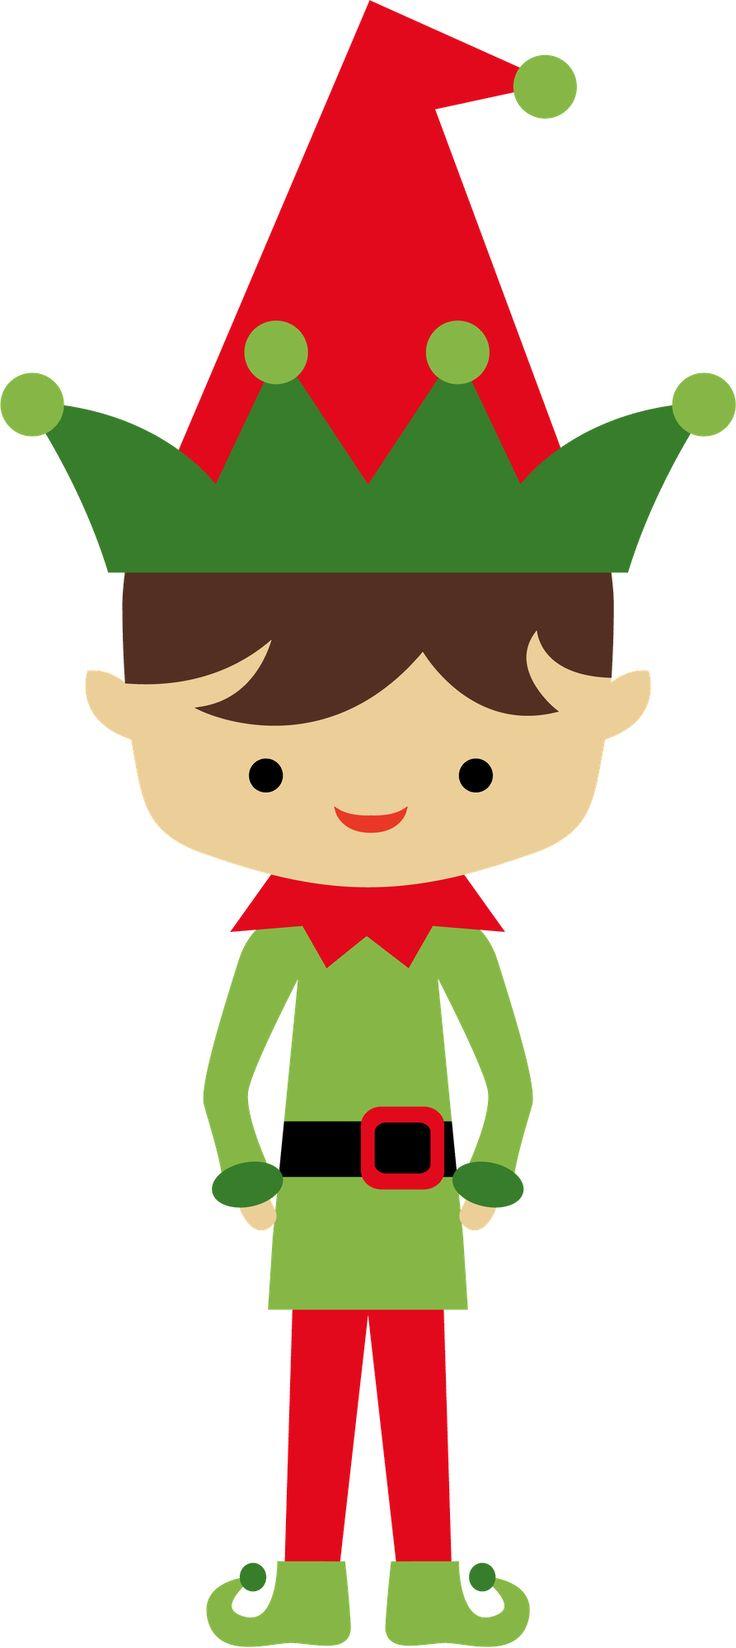 CHRISTMAS ELF LITTLE BOY CLIP ART-CHRISTMAS ELF LITTLE BOY CLIP ART-0